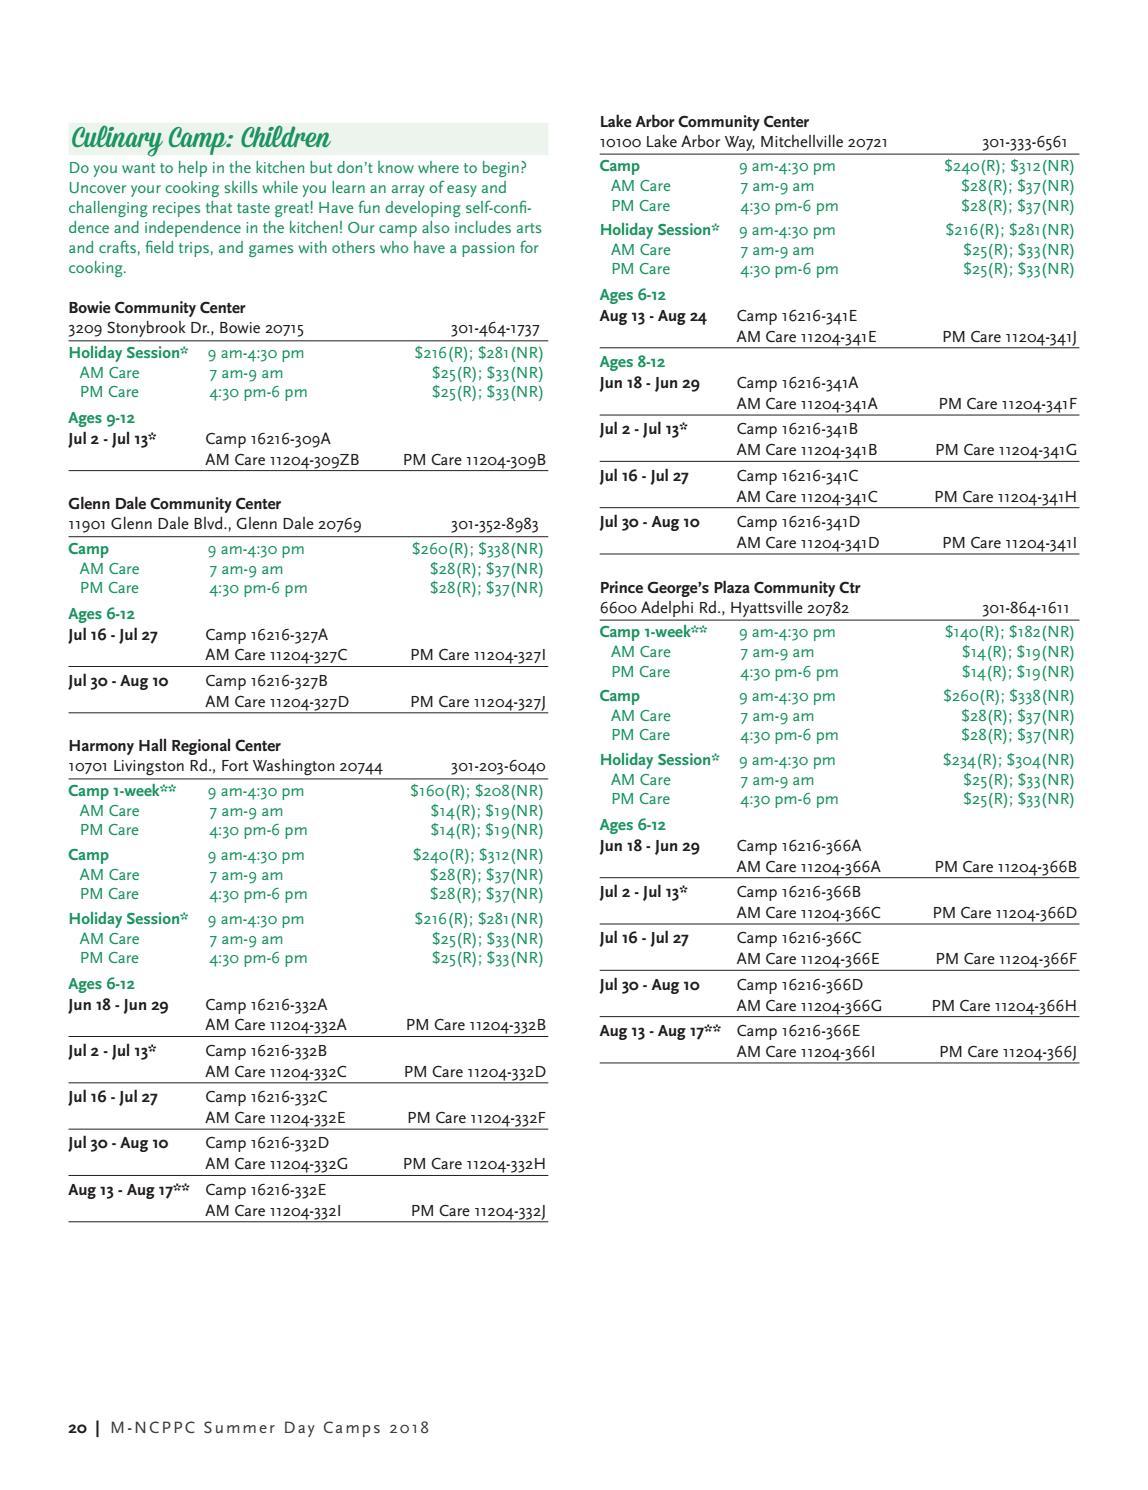 2cf979d515 2018 Summer Program Brochure by M-NCPPC